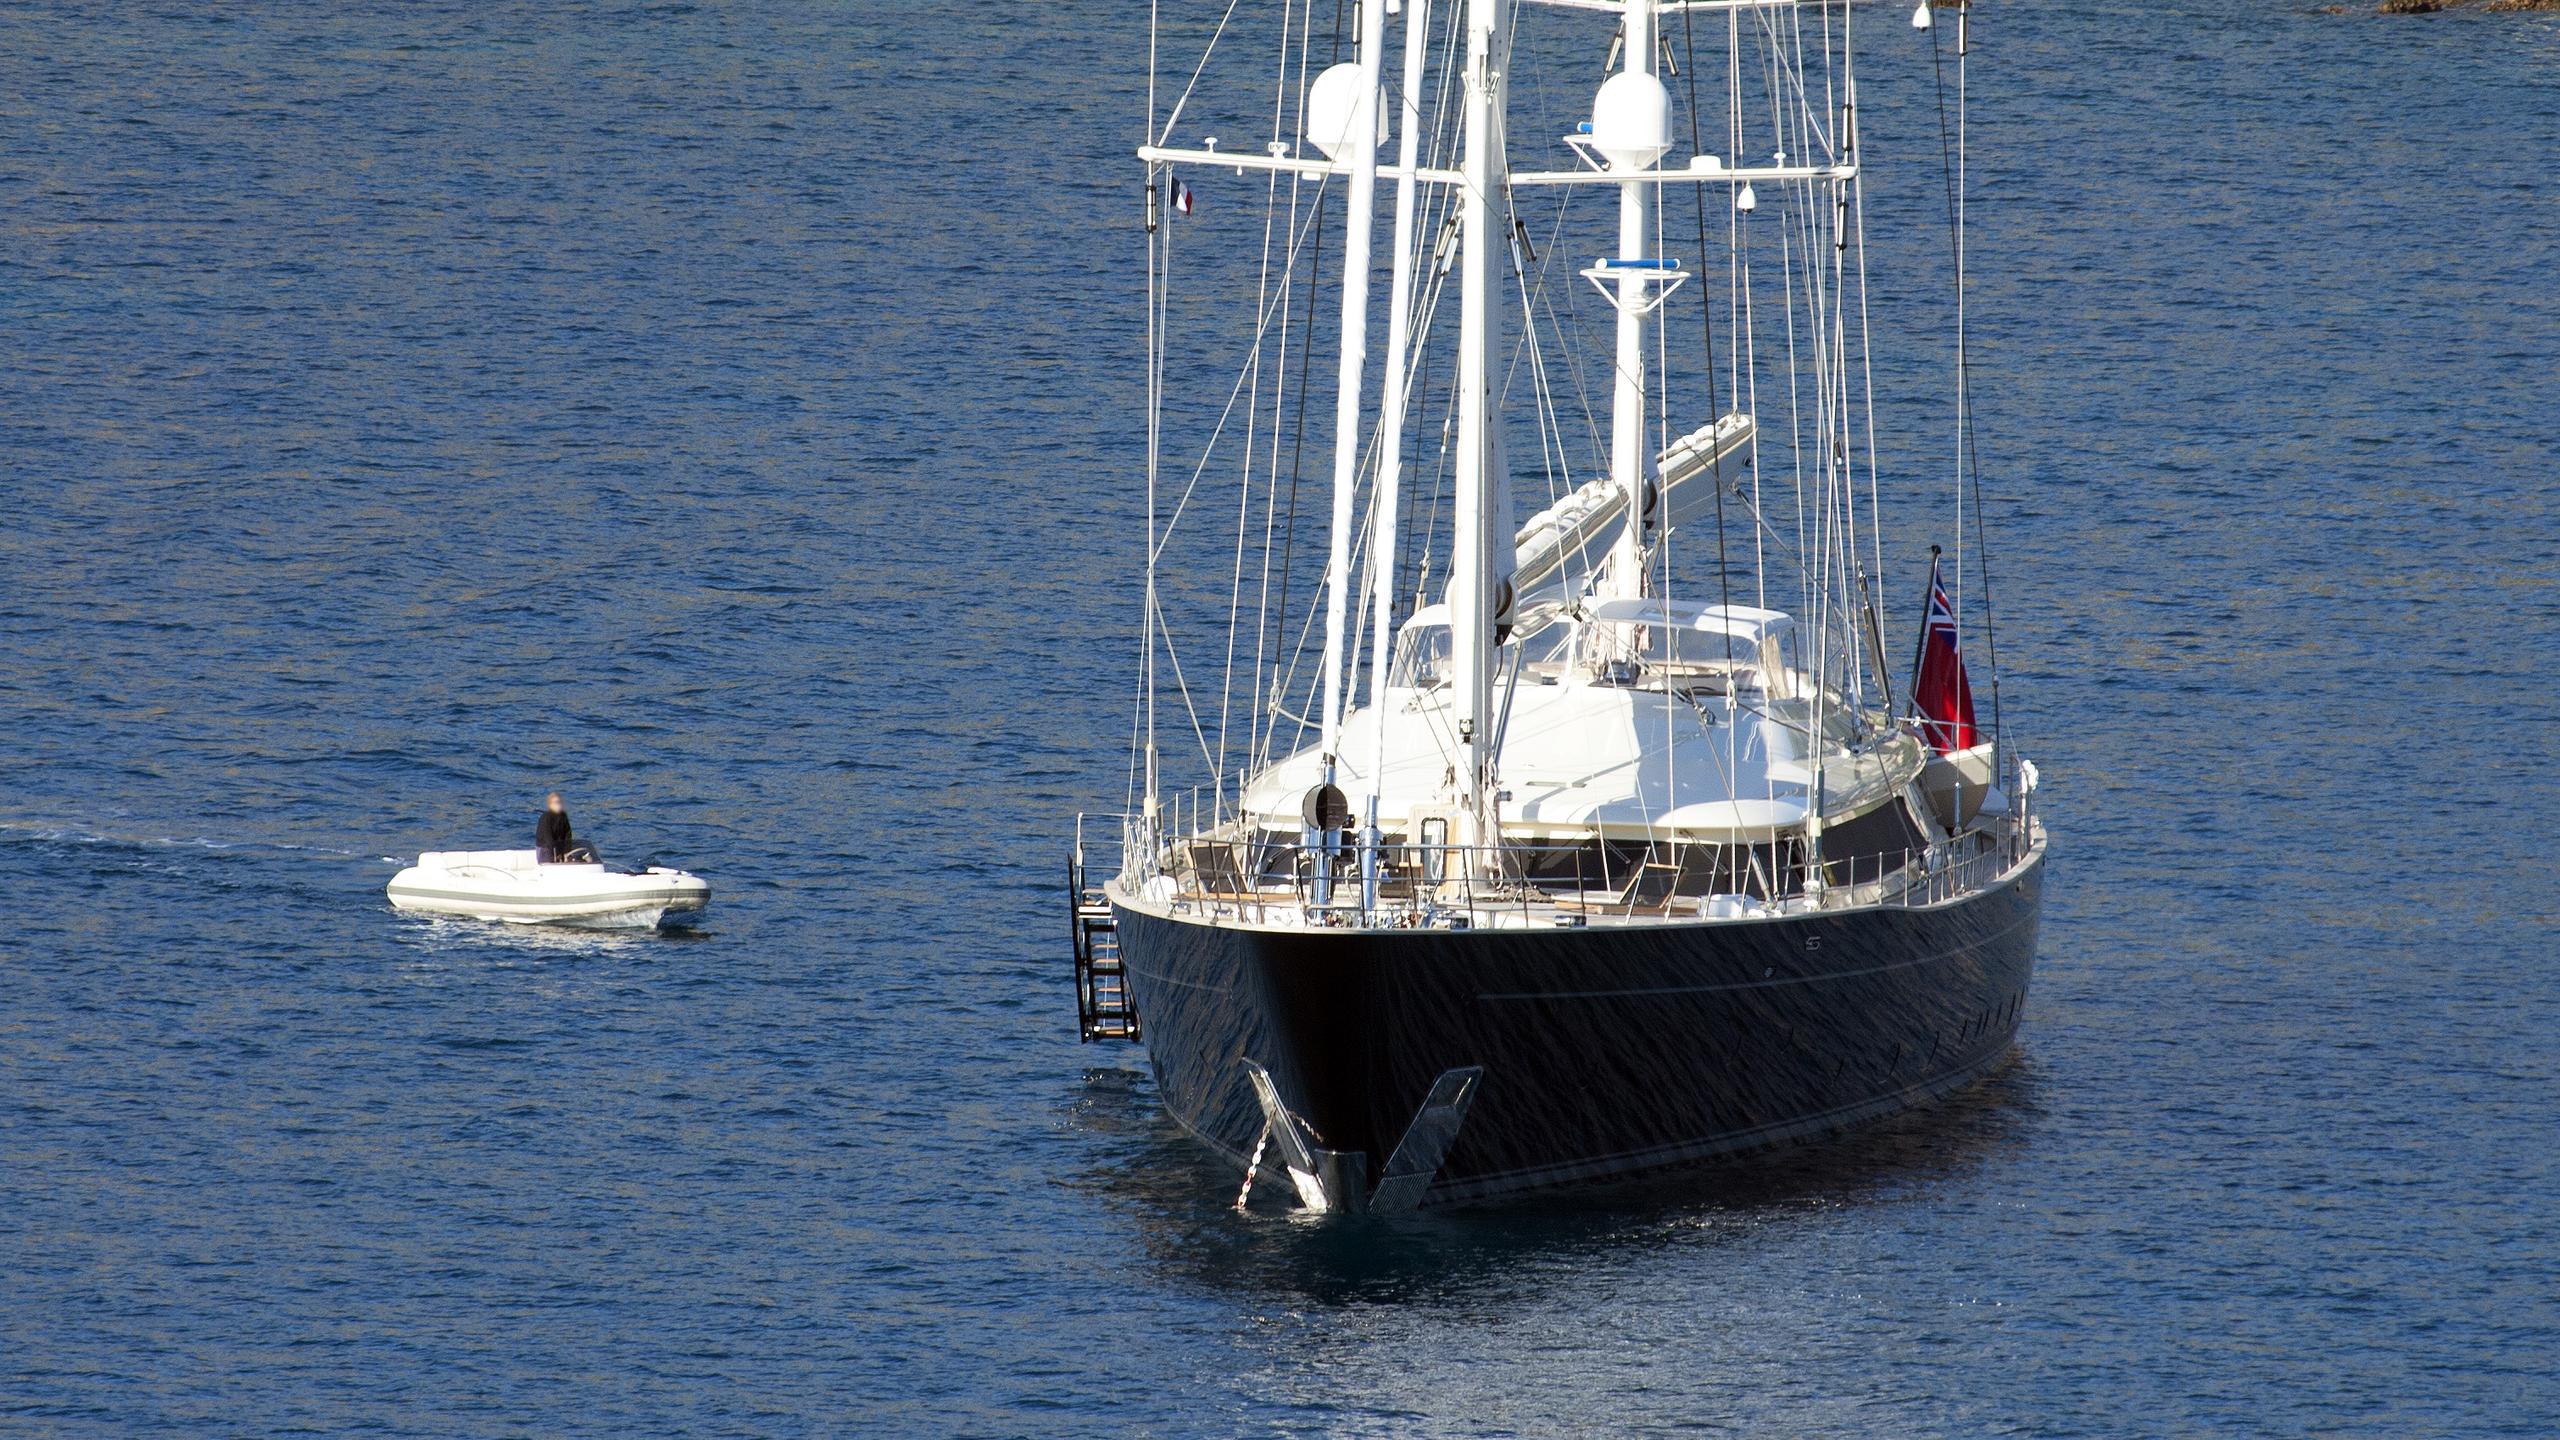 asahi-sailing-yacht-perini-navi-2009-56m-bow-tender